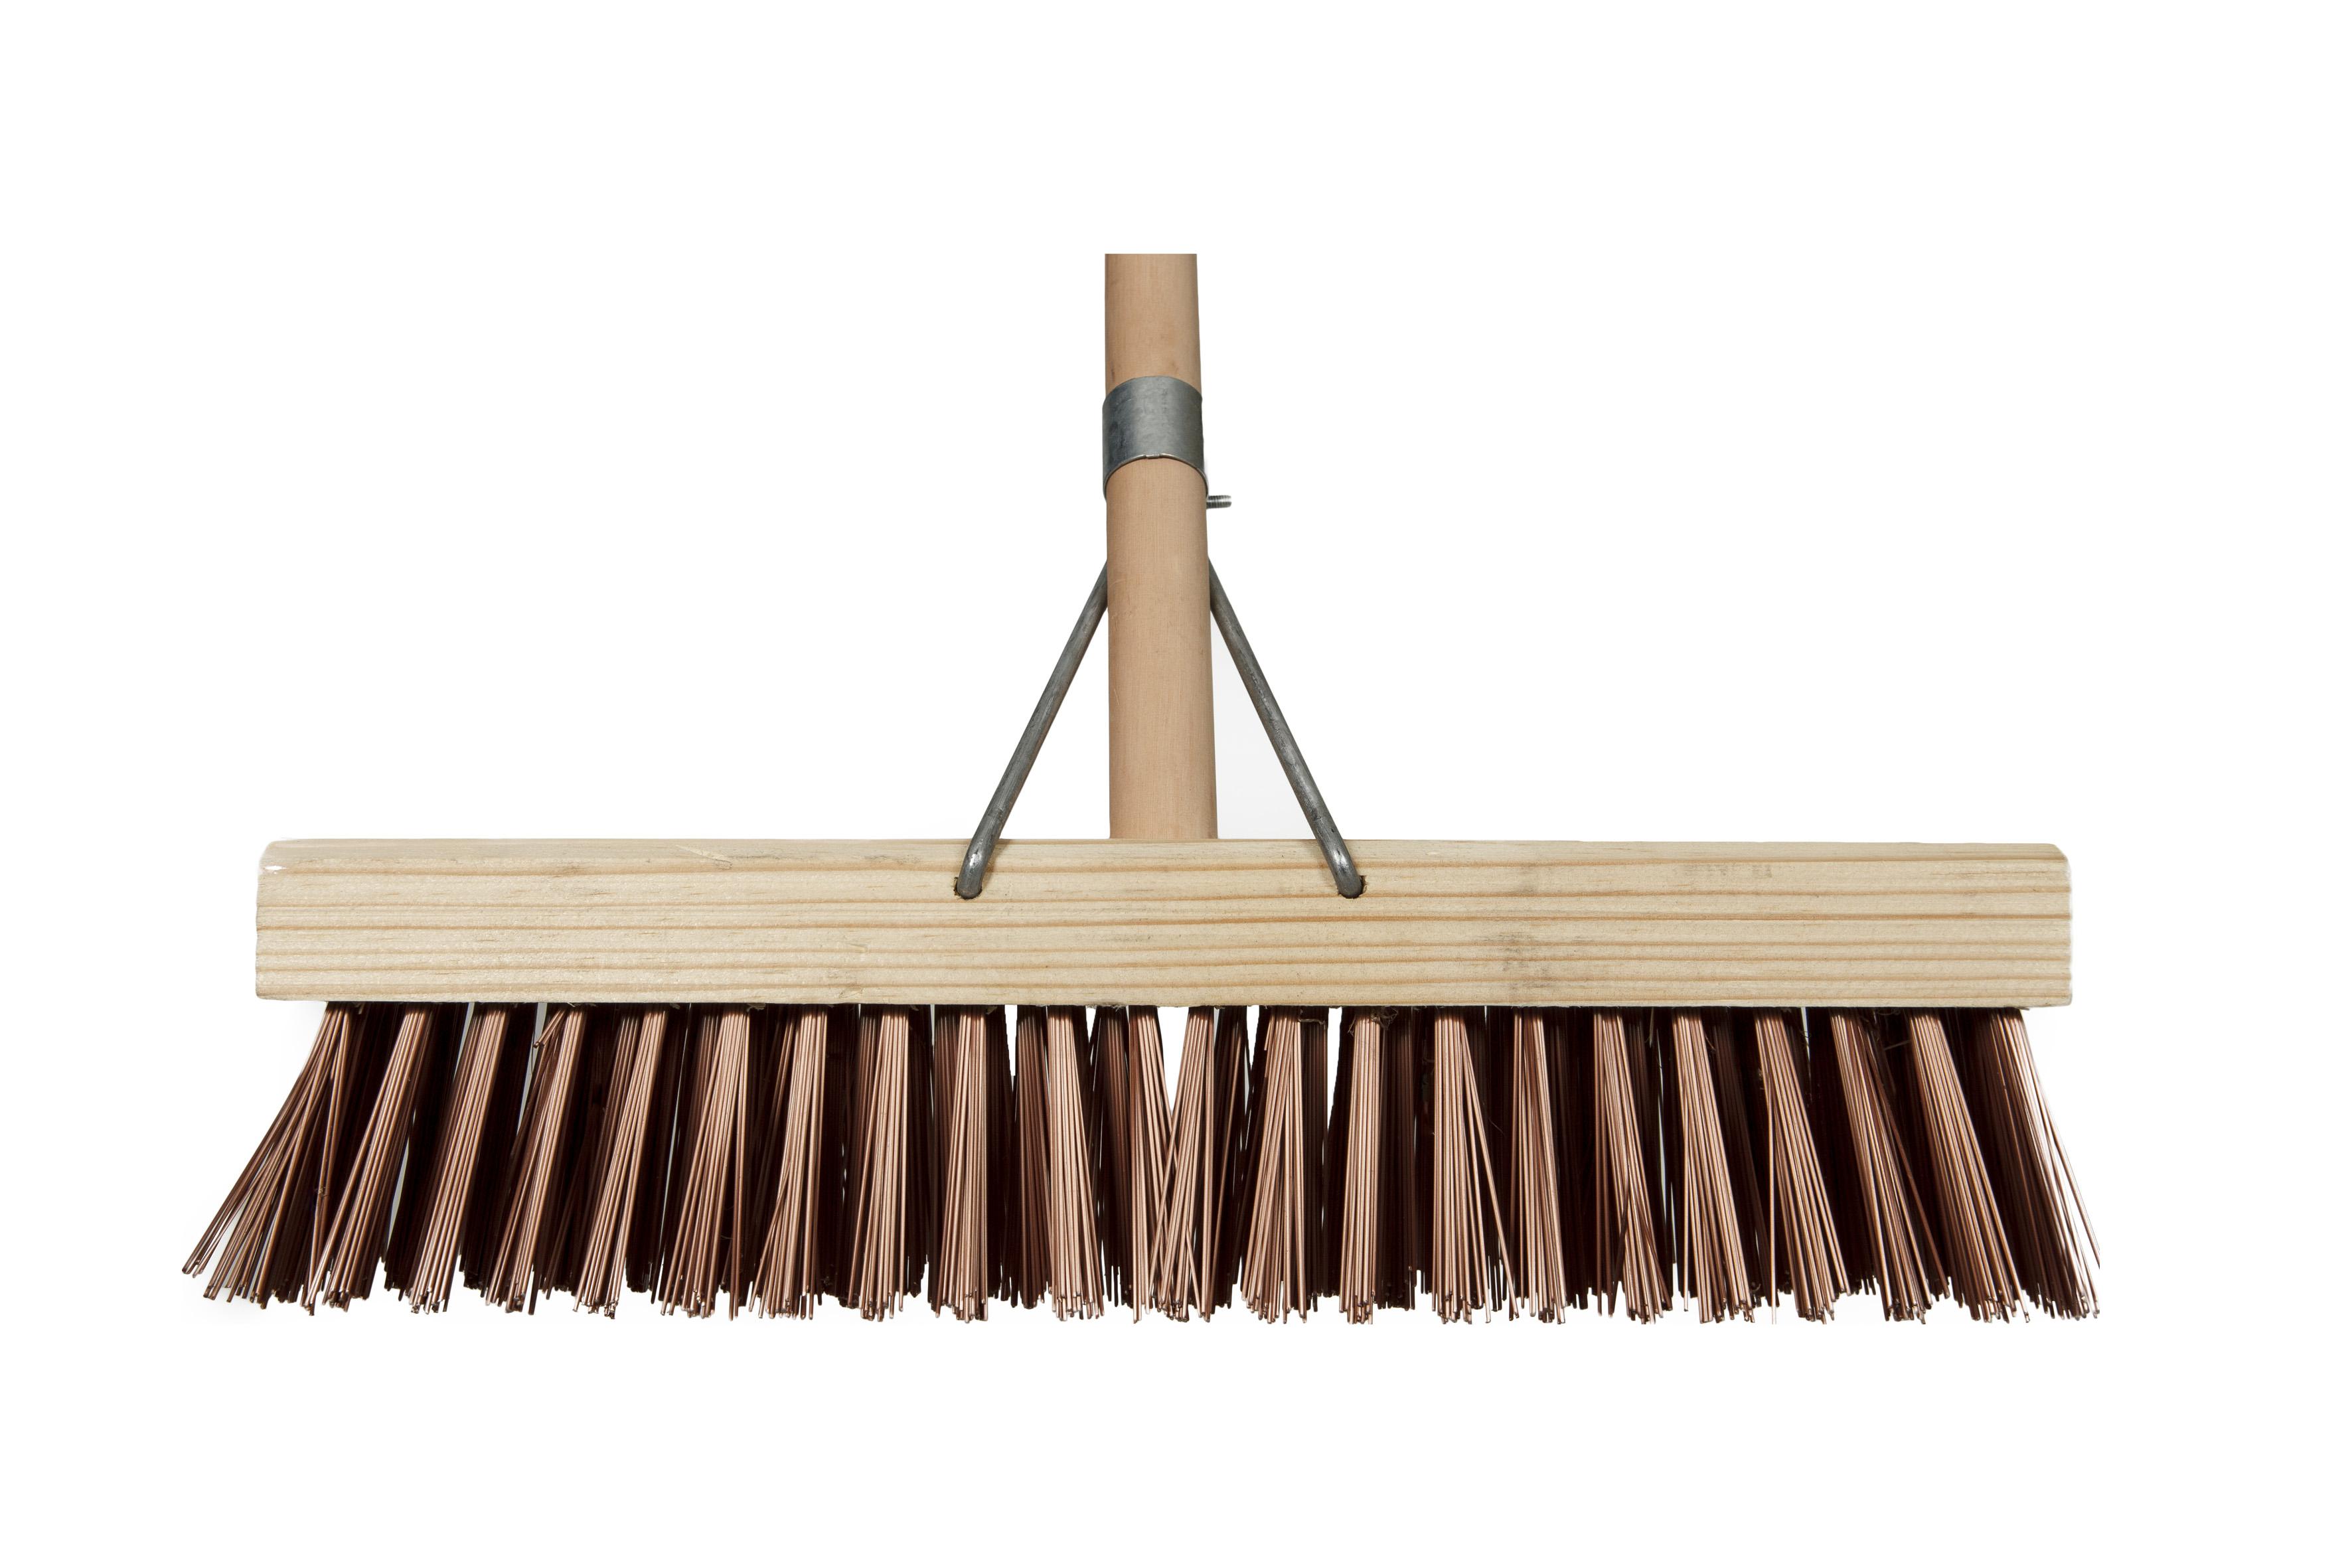 Hectoserve Platform Broom Hard